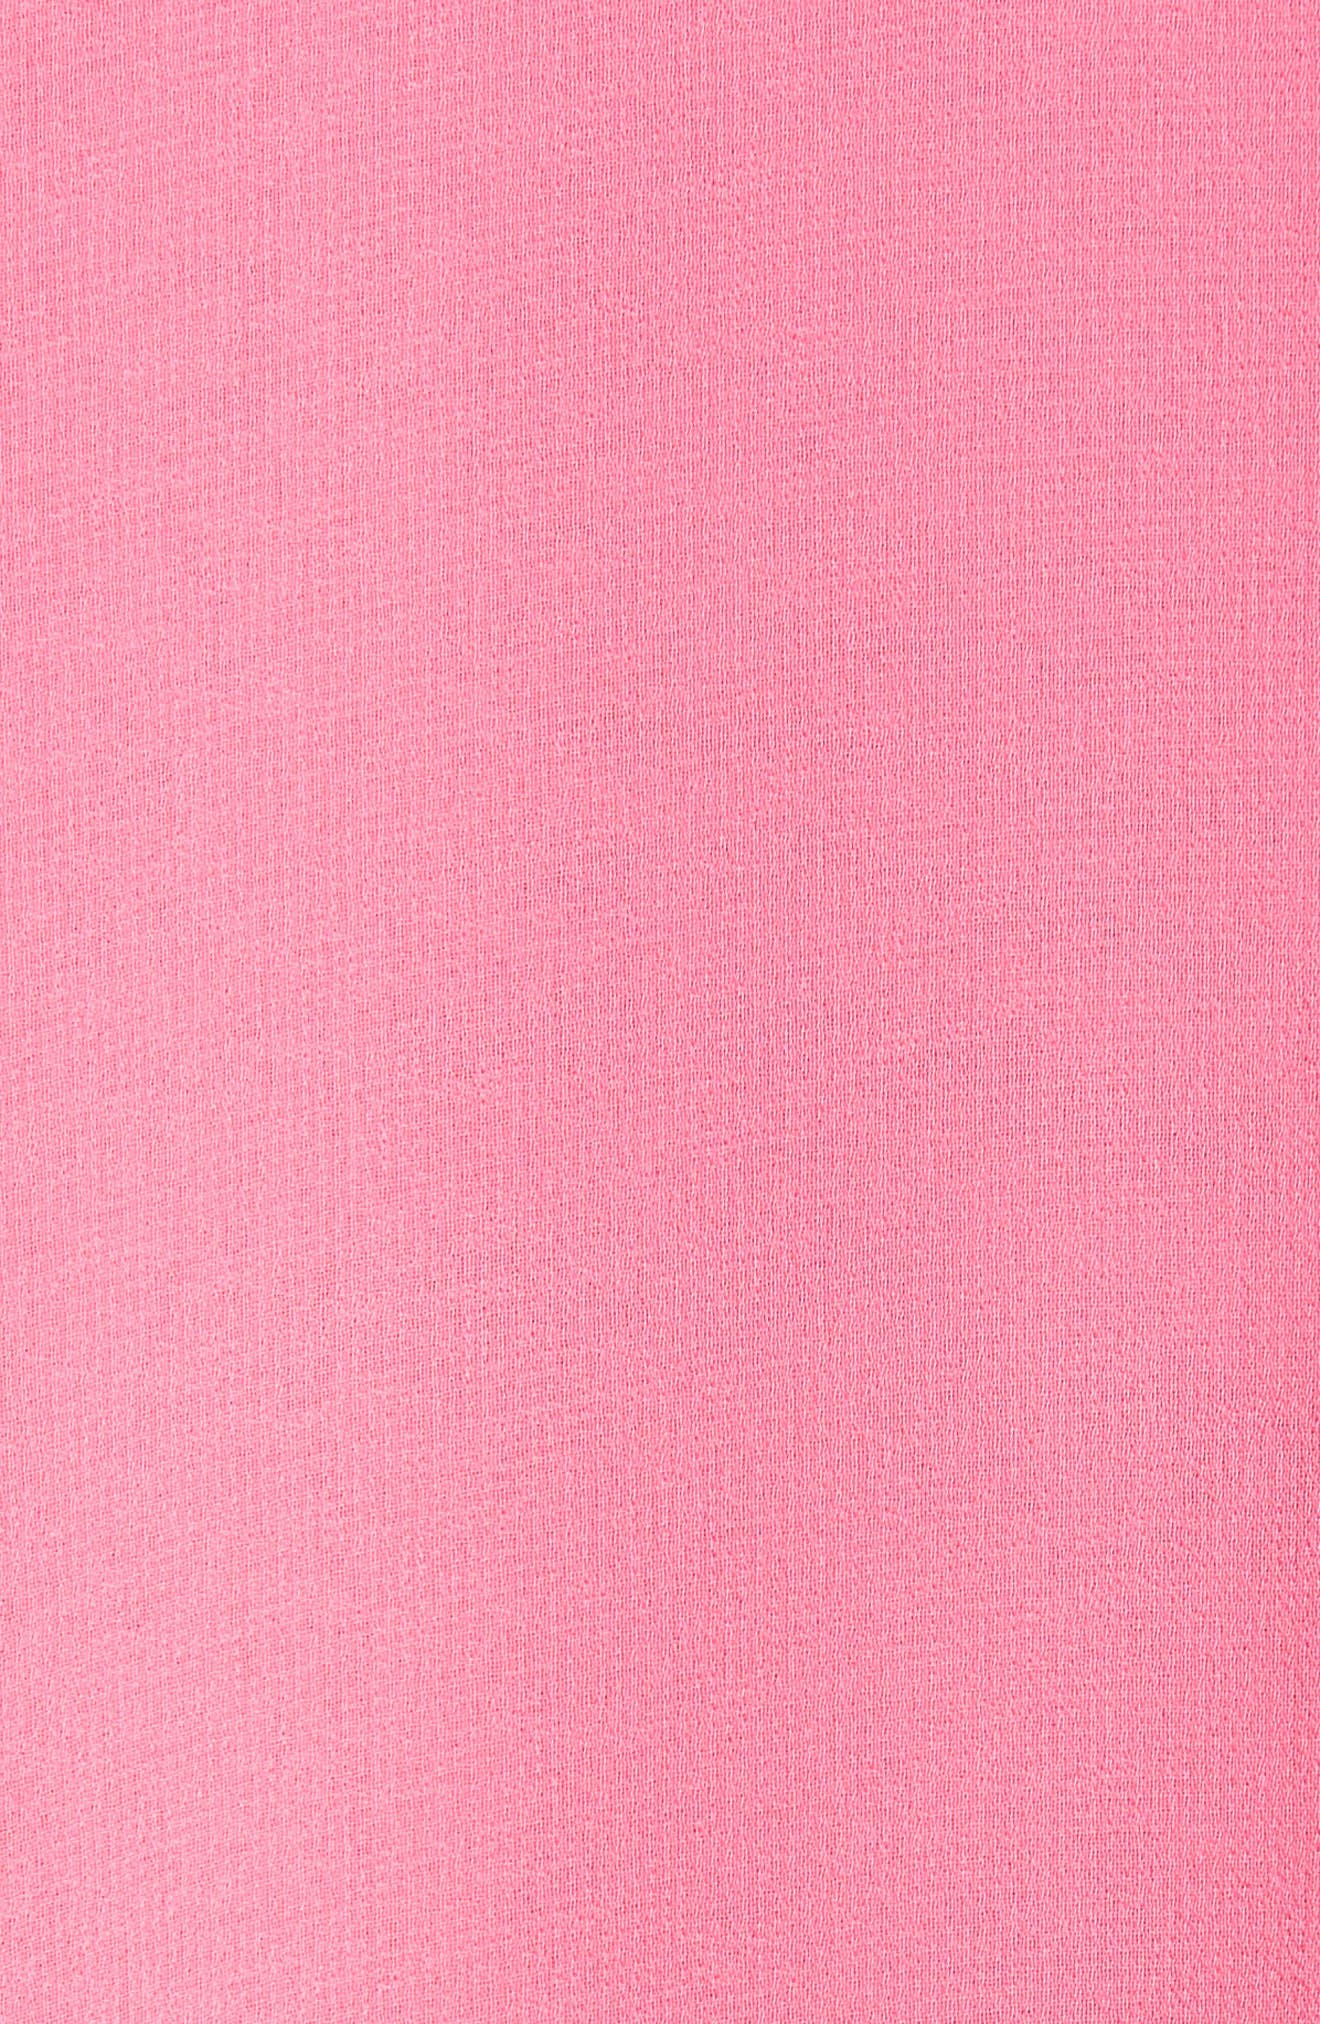 A-Line Chiffon Dress,                             Alternate thumbnail 5, color,                             Pink Zenna